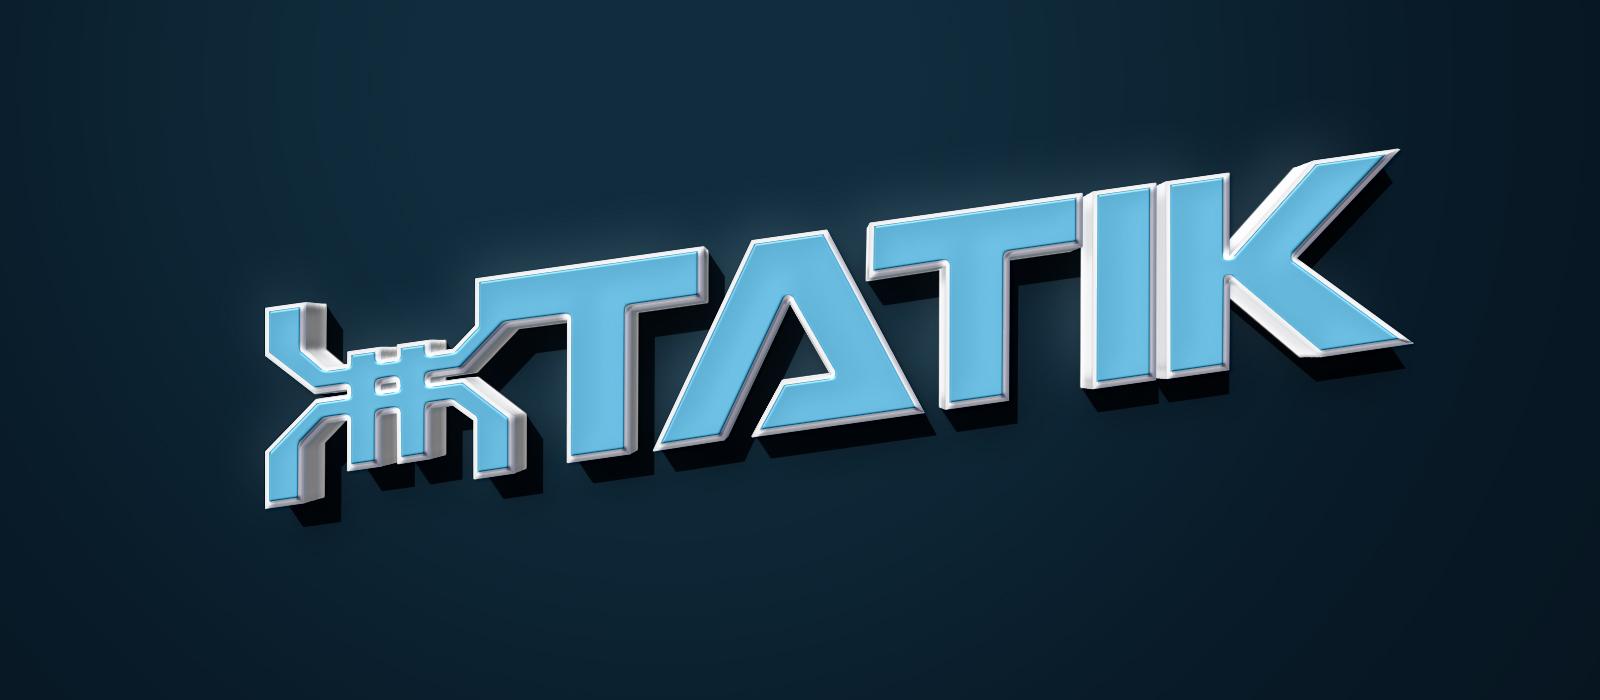 Xtatik logotype